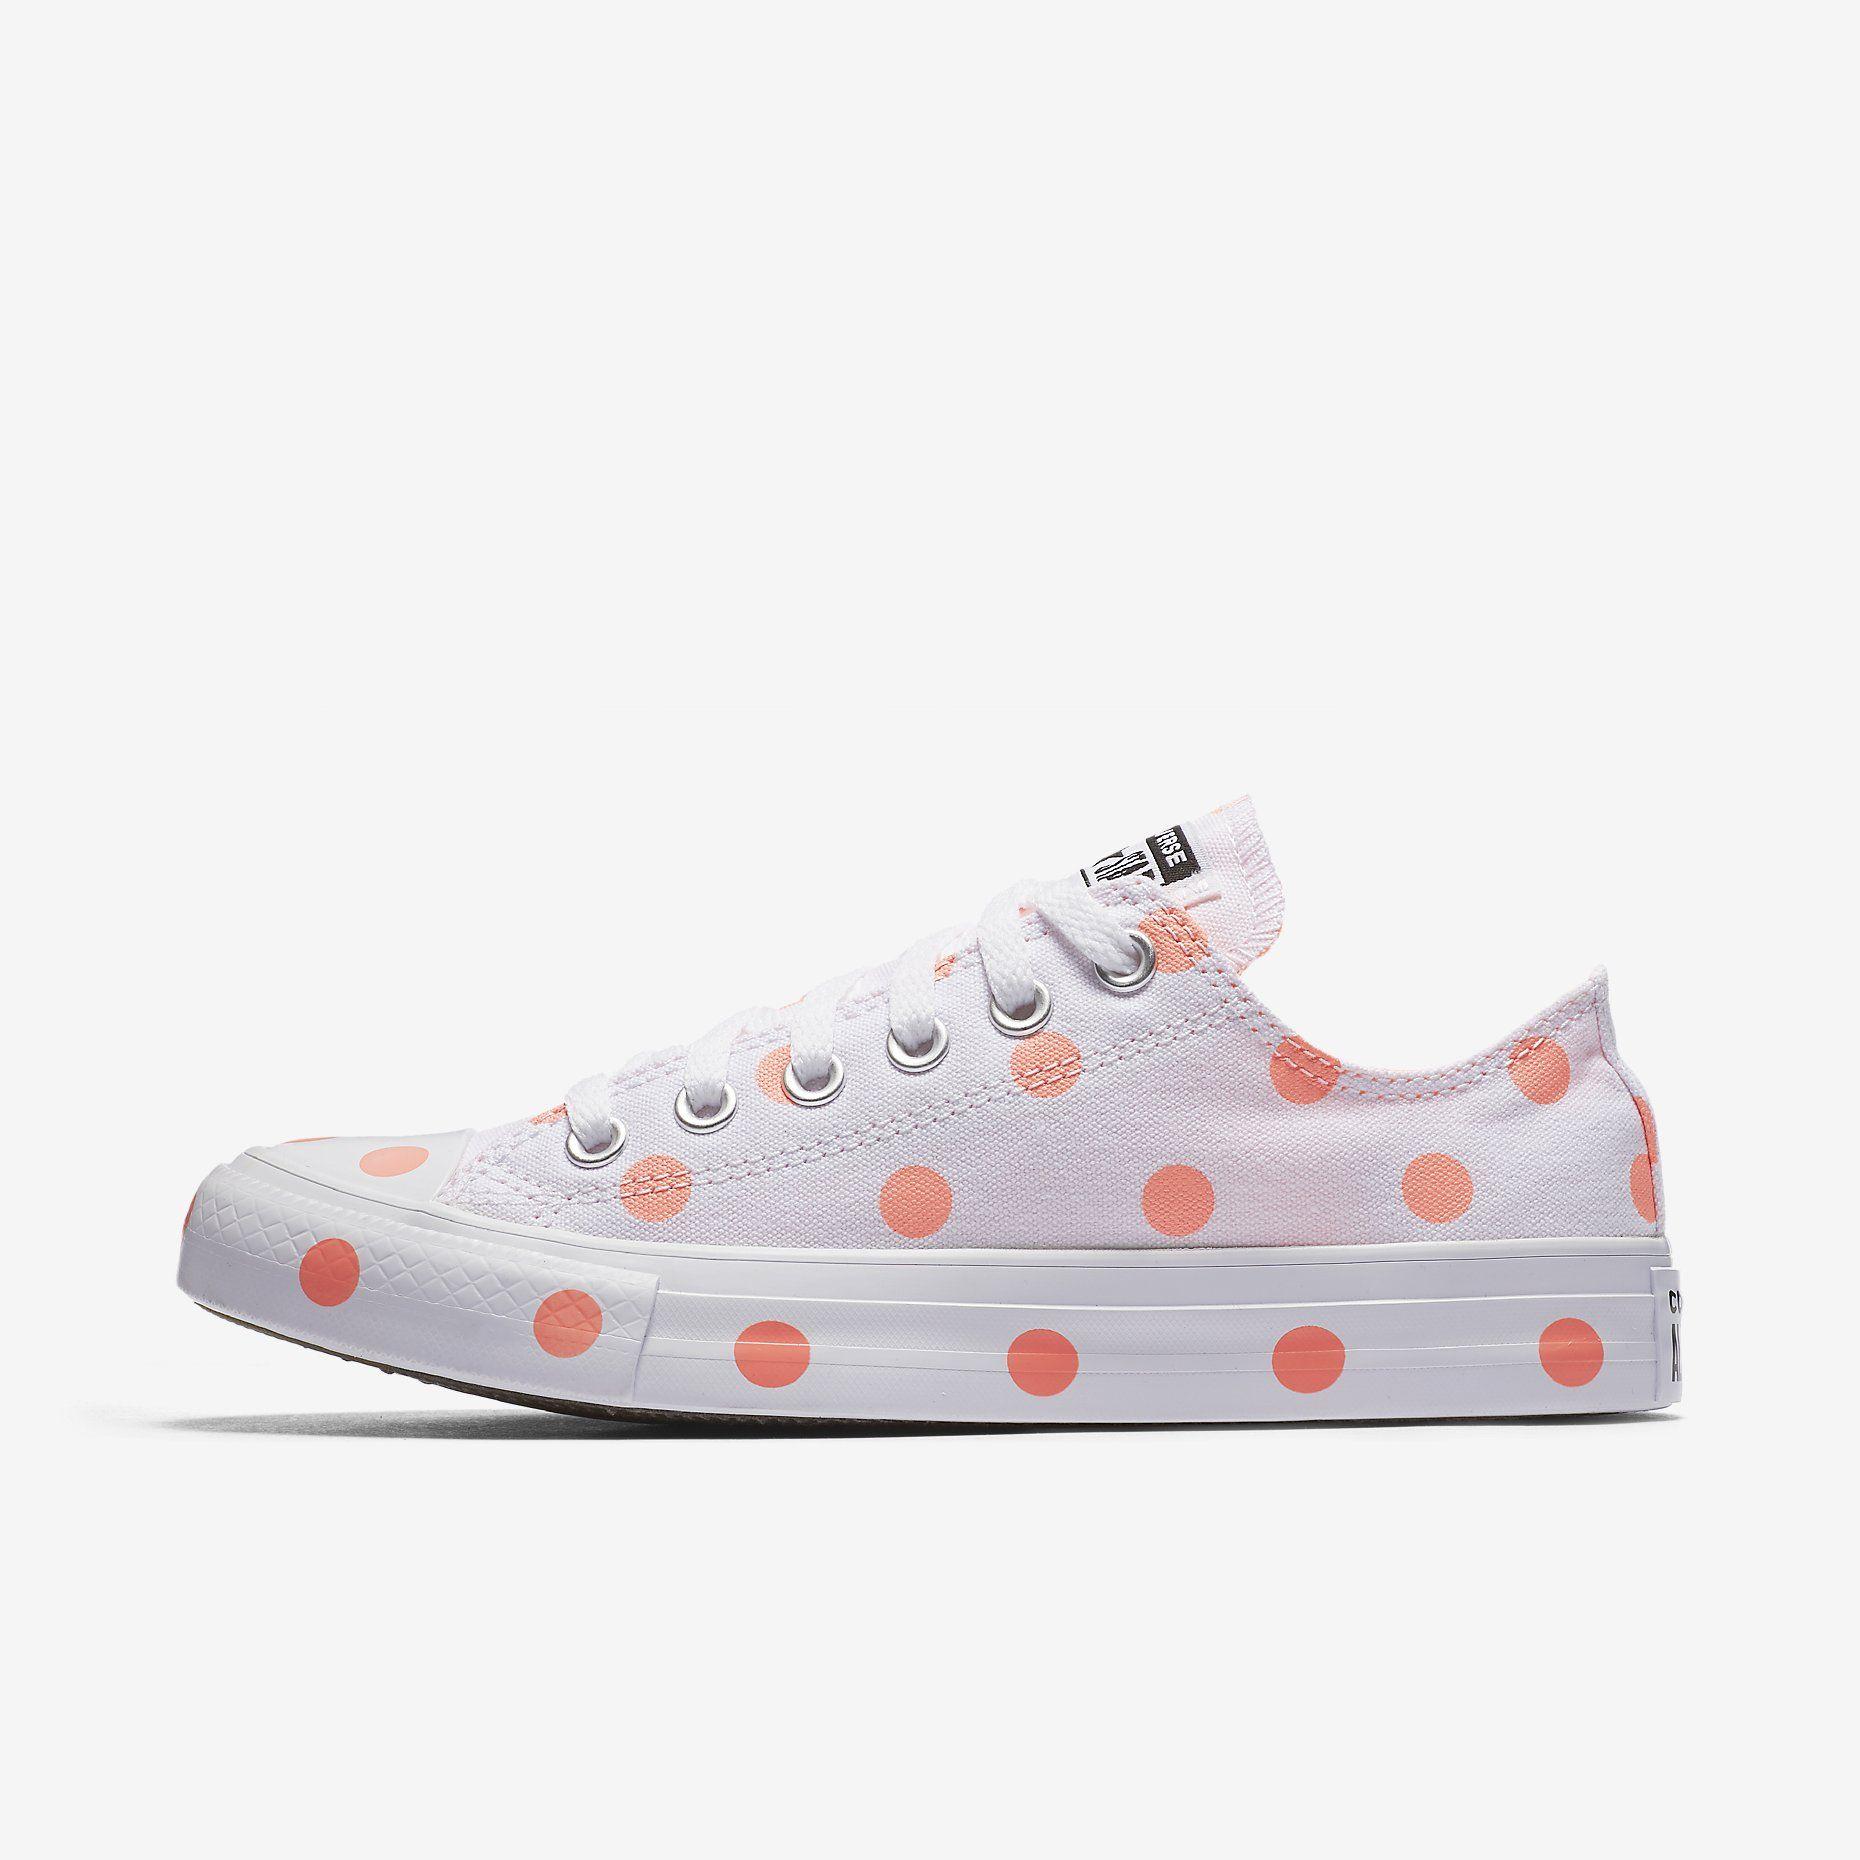 034c1b1d0941 Converse Chuck Taylor All Star Polka Dots Low Top Women s Shoe. Nike ...